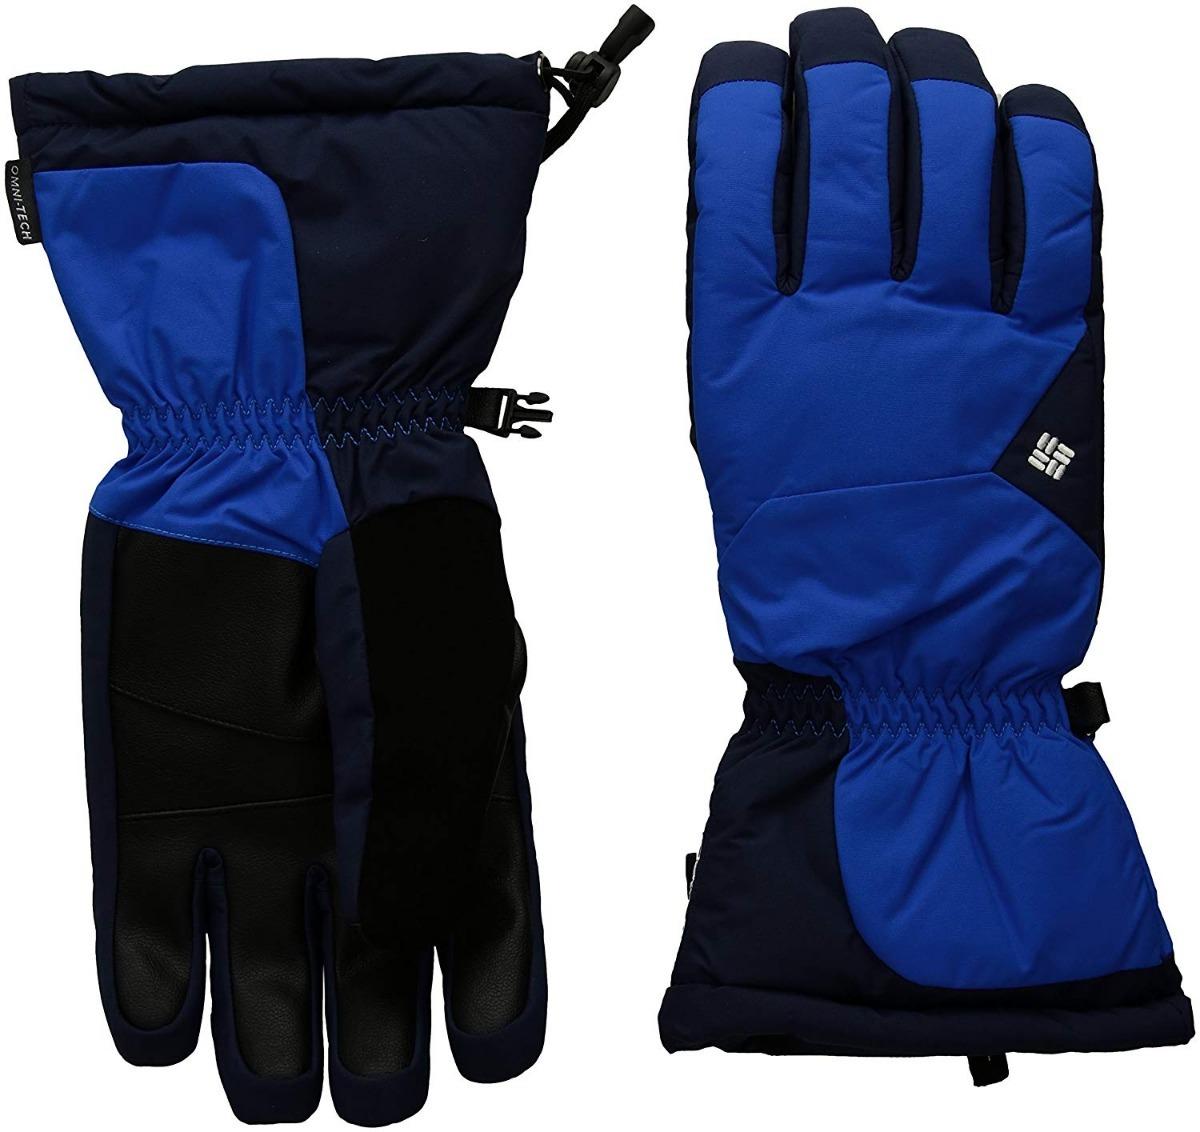 597d16ae36b guantes columbia tumalo impermeables nieve frio extremo. Cargando zoom.